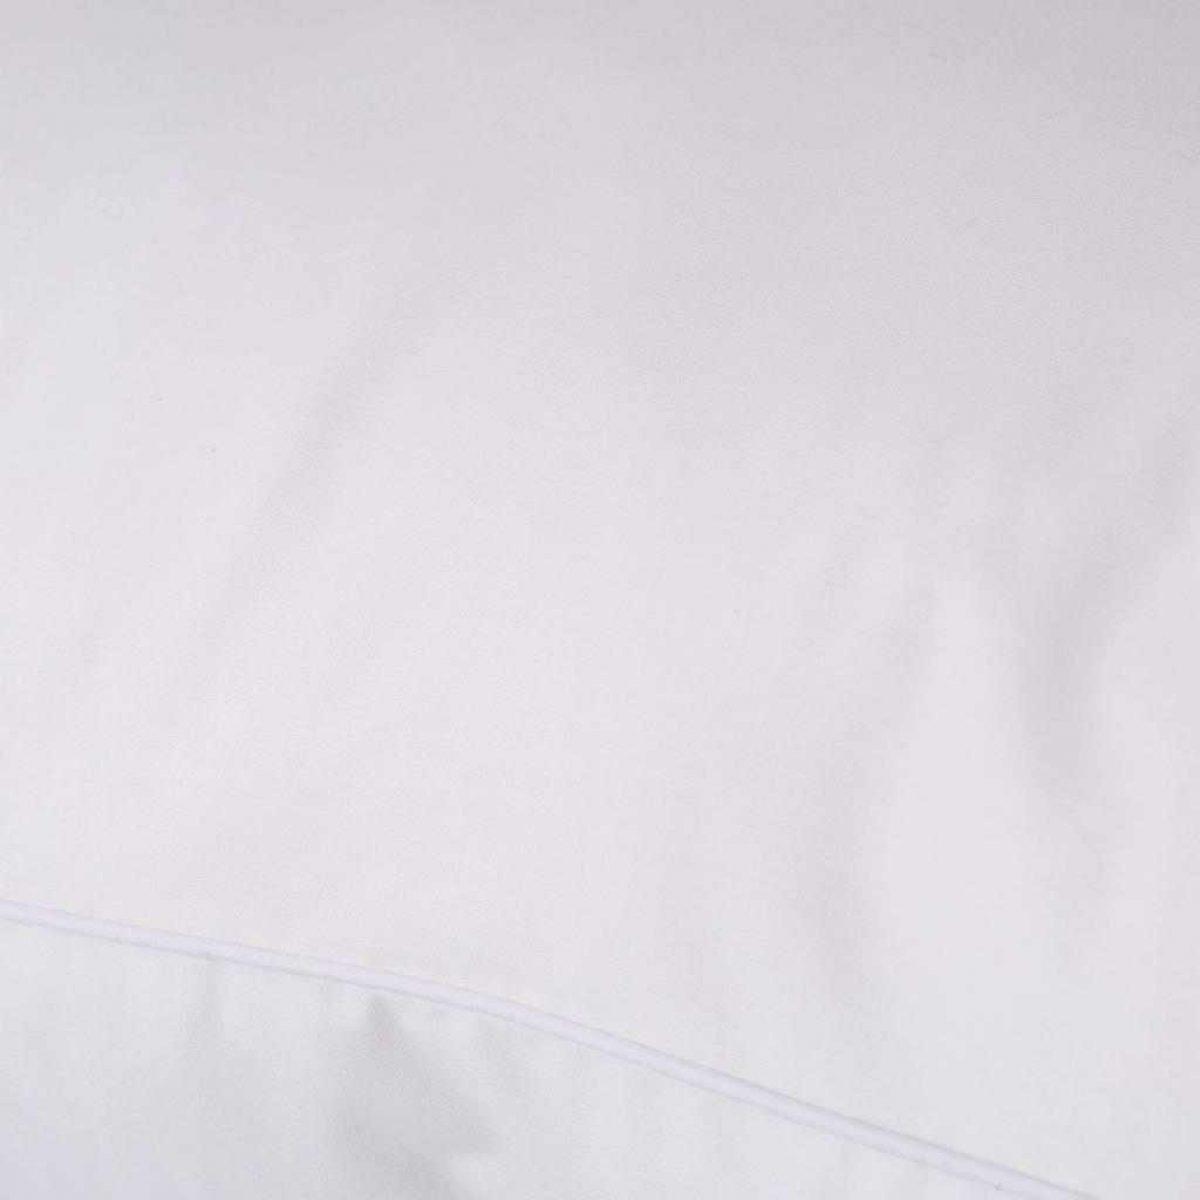 Fine Bedding Spundown Pillow Detail 1024x1024